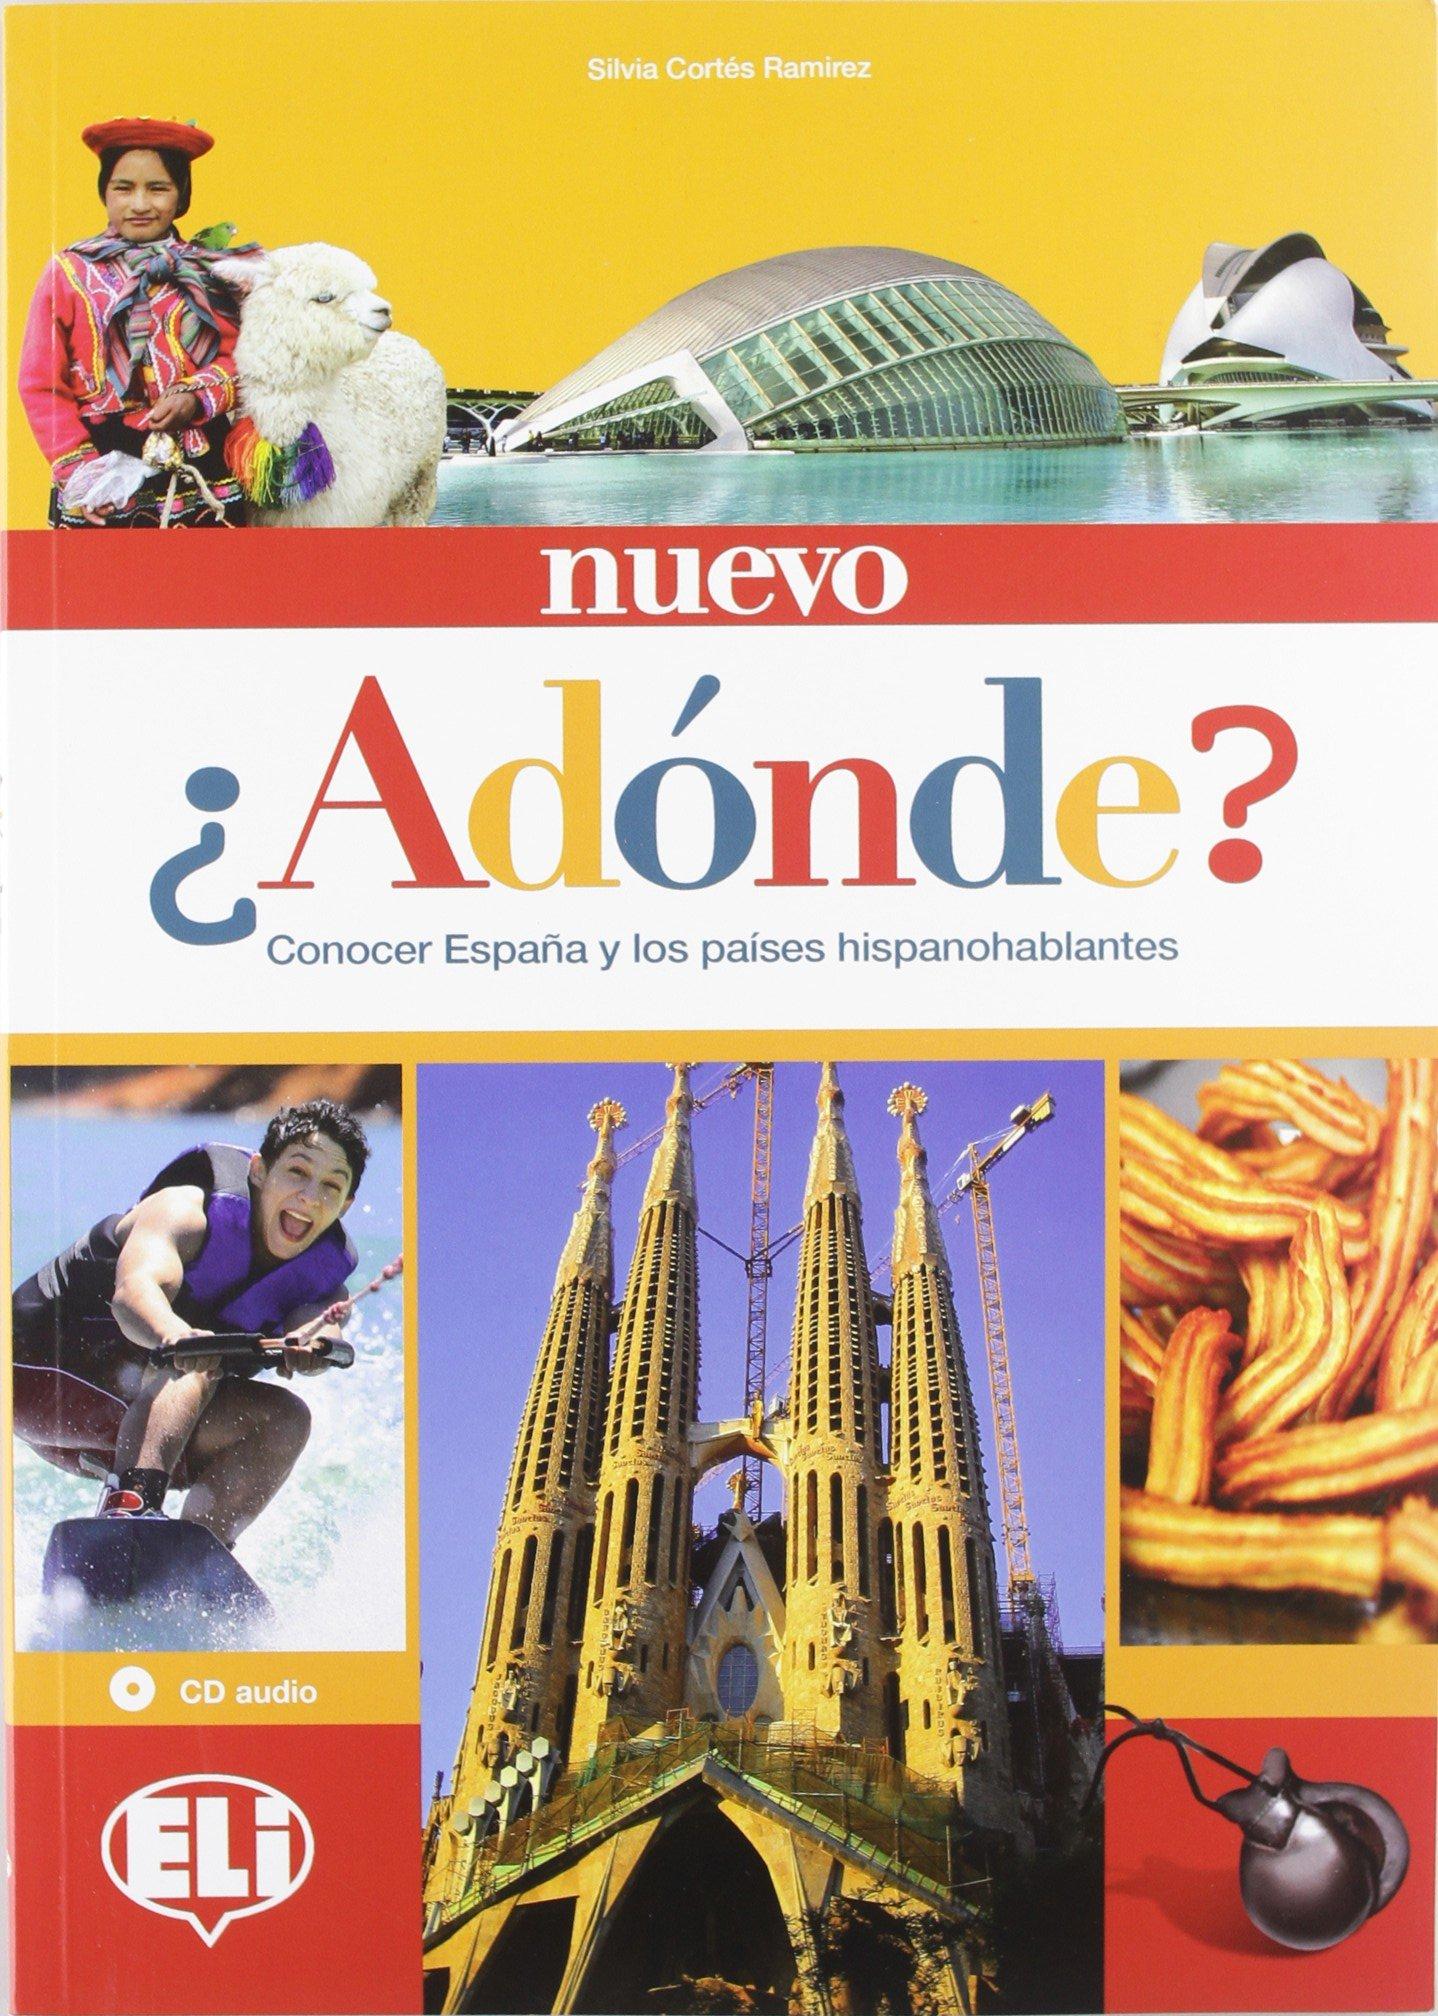 NUEVO ADONDE? +CD (Cultura e civiltà): Amazon.es: AA.VV.: Libros